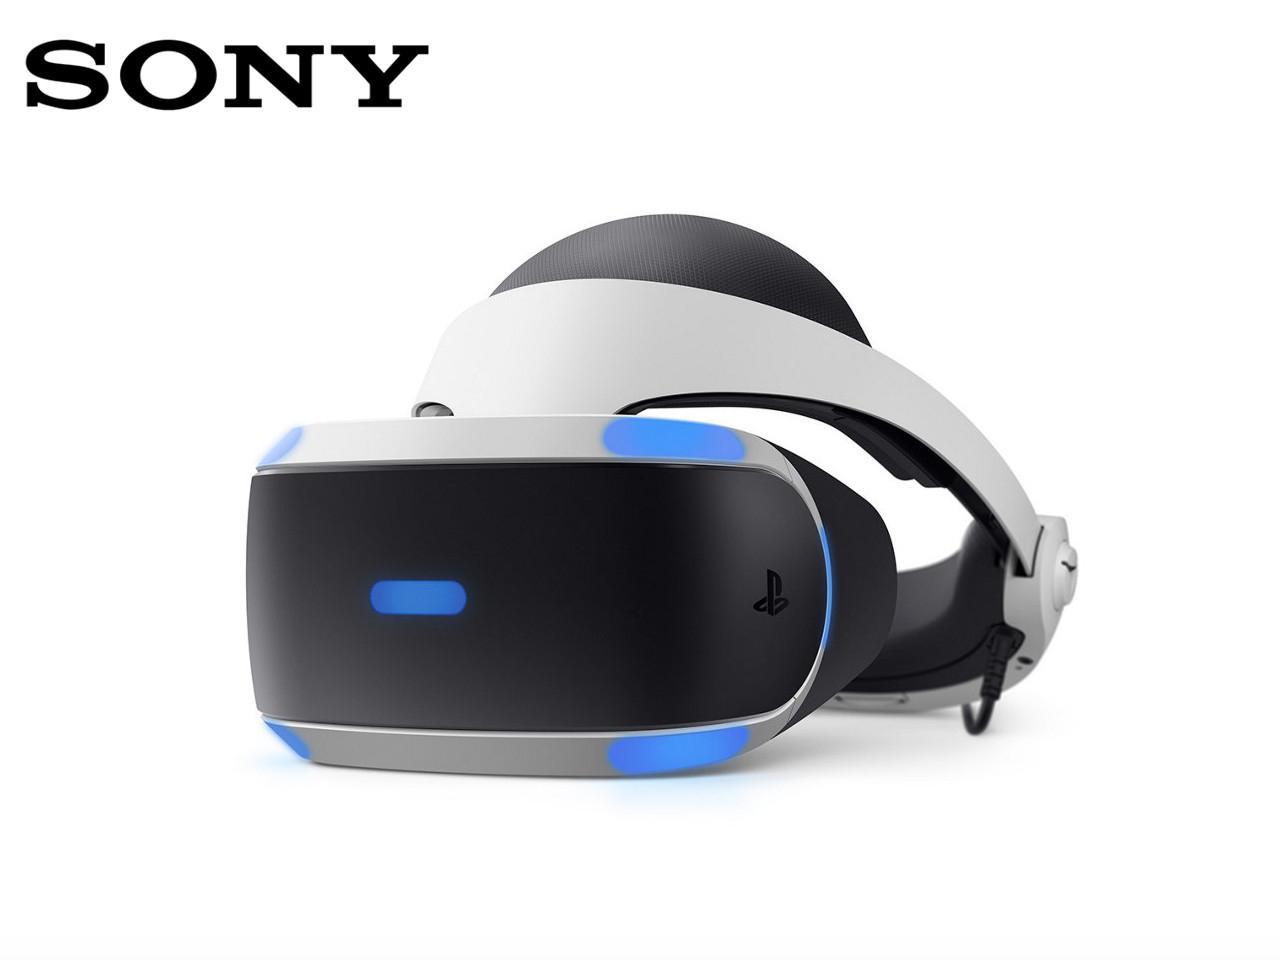 SONY Playstation VR + kamera